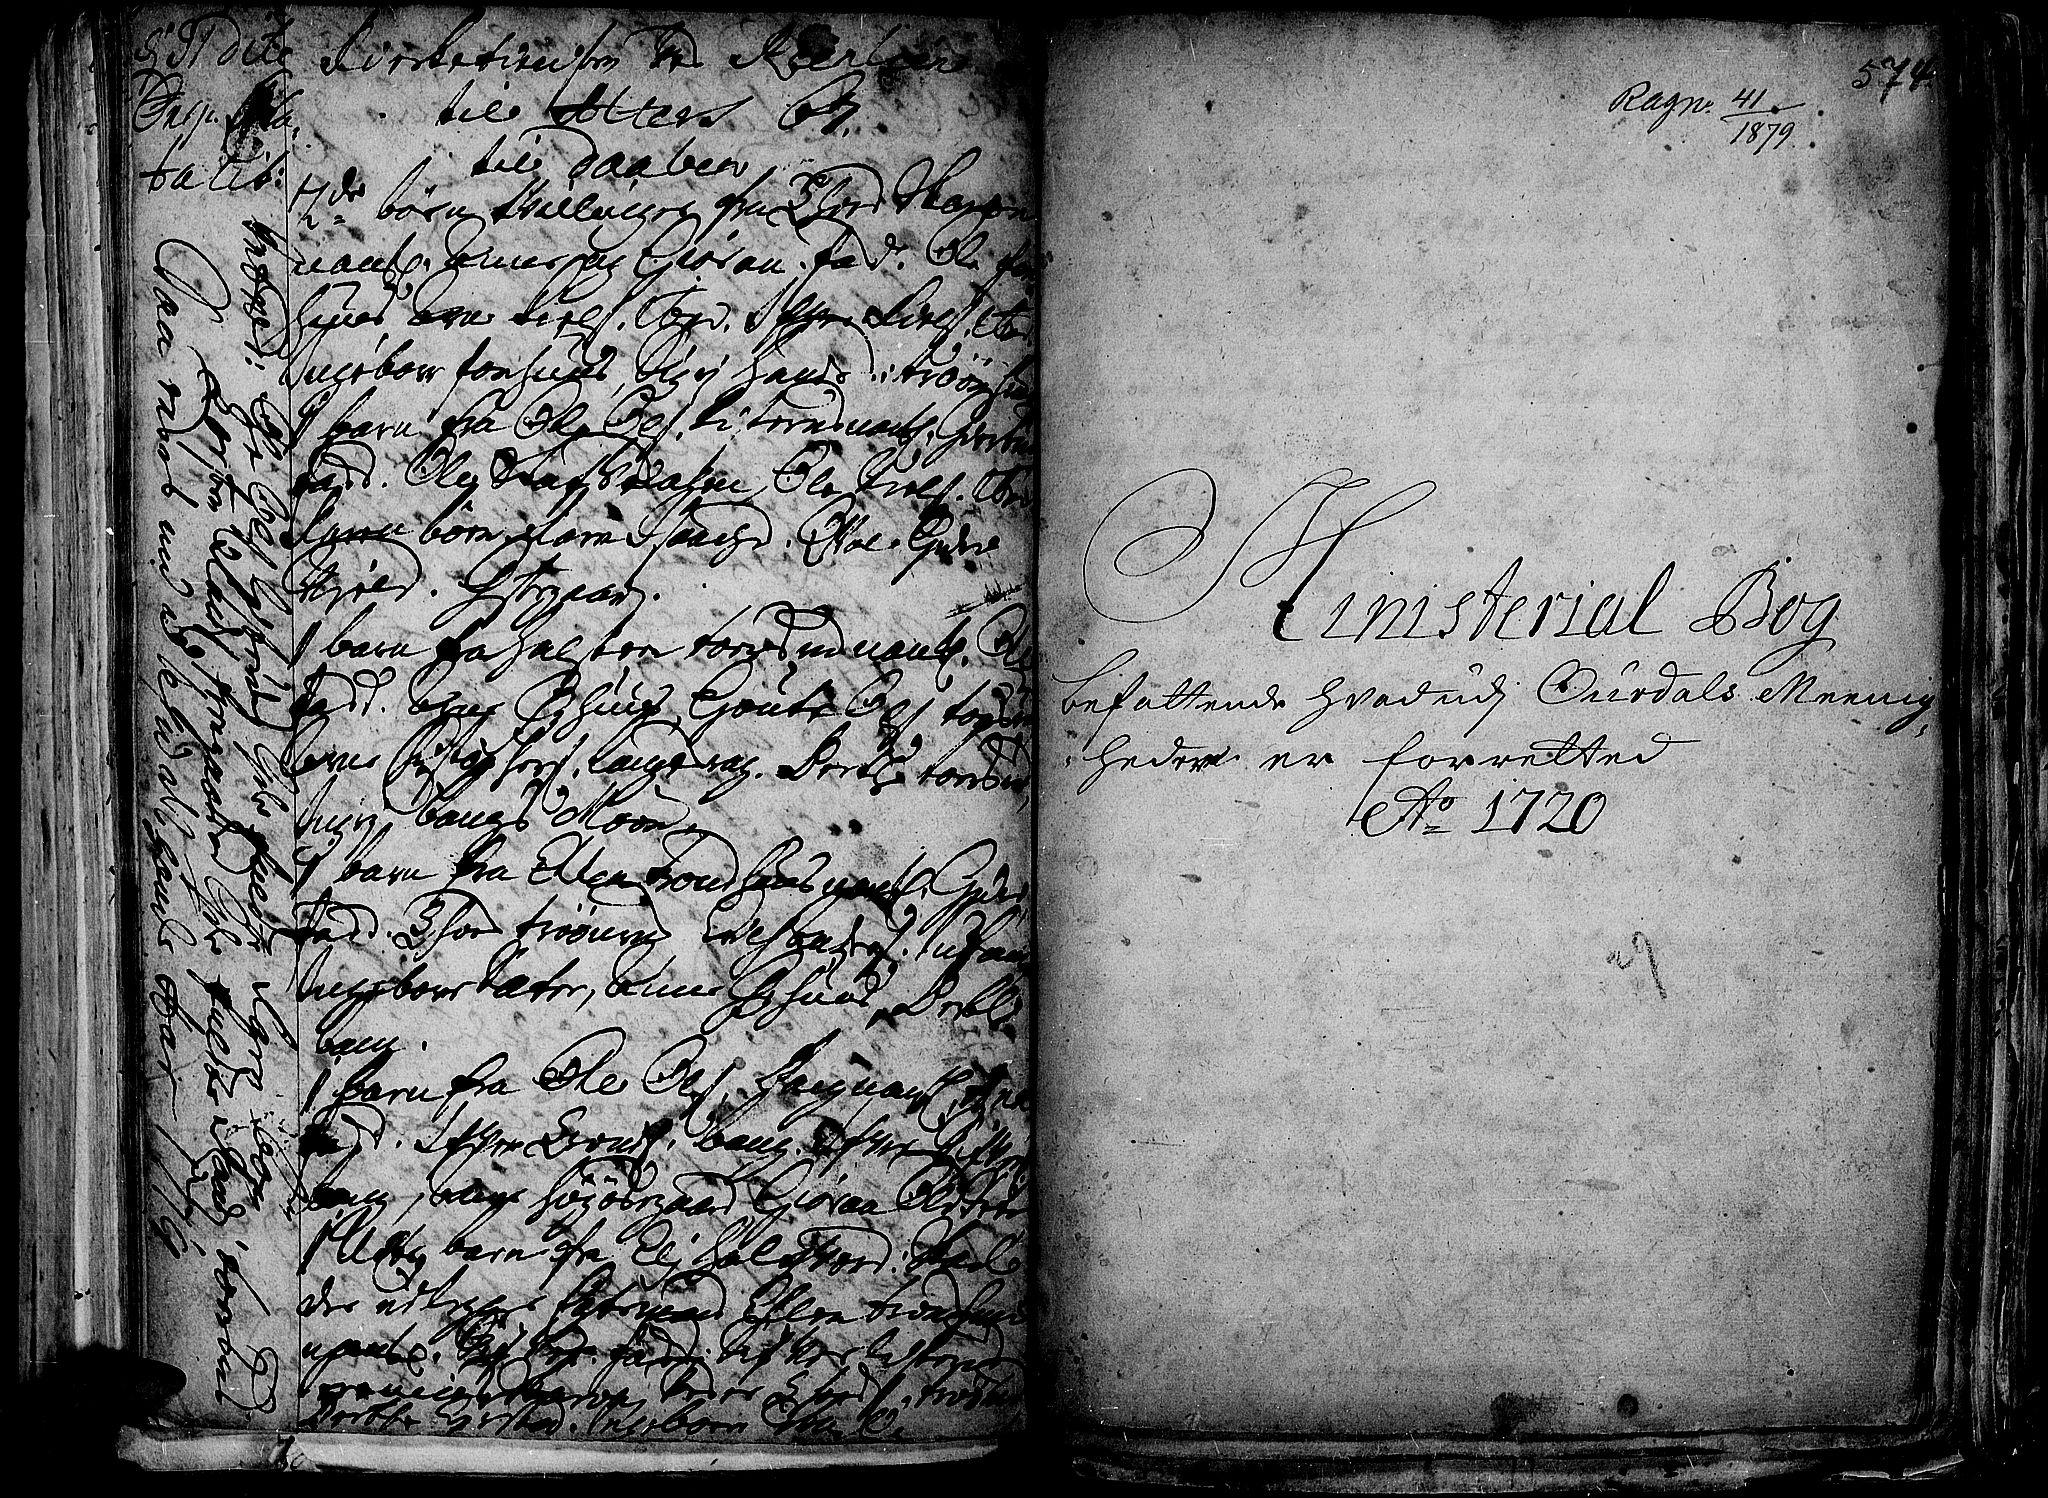 SAH, Aurdal prestekontor, Ministerialbok nr. 1-3, 1692-1730, s. 574